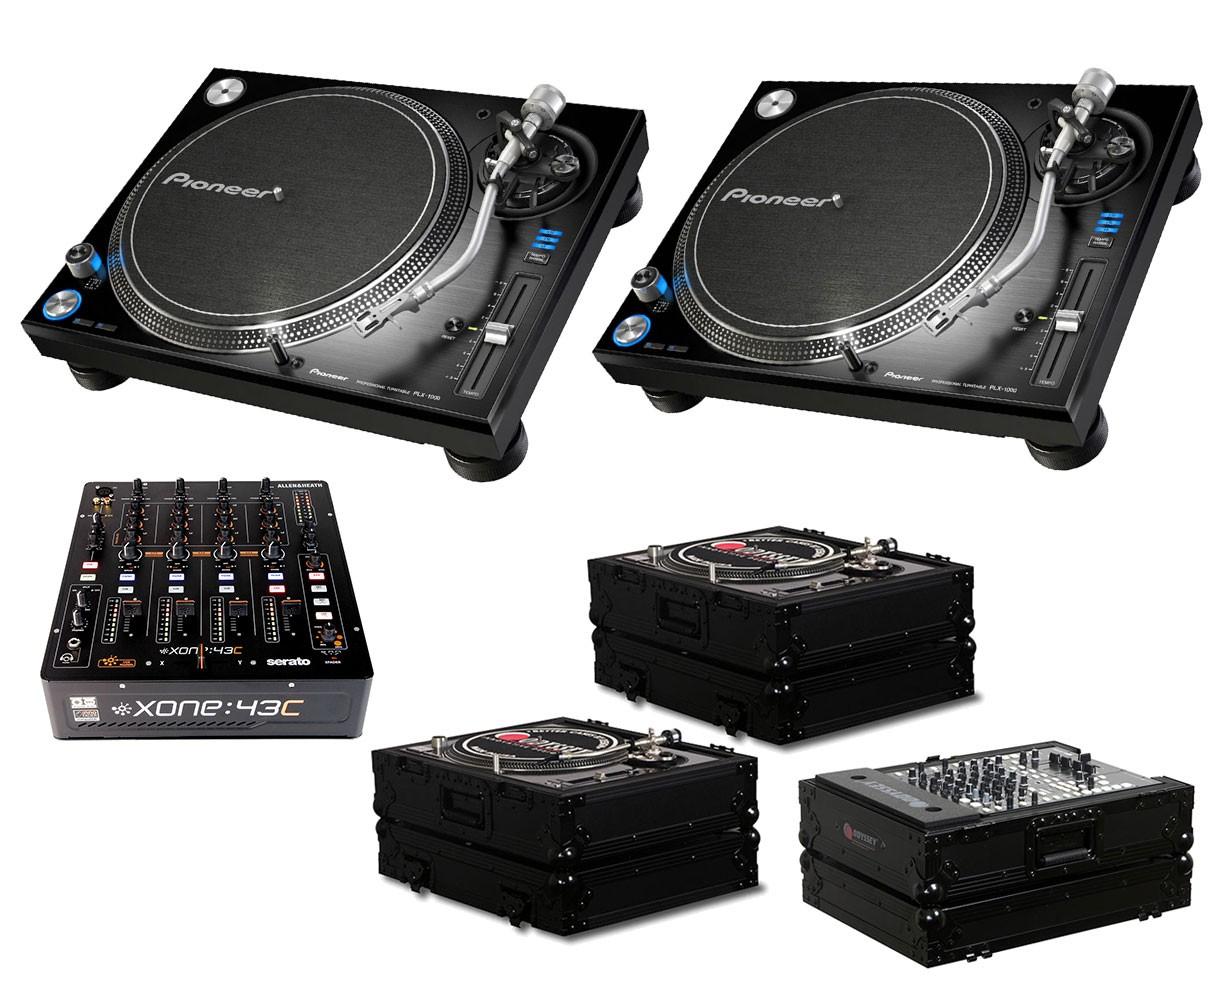 2x Pioneer PLX-1000 + Xone:43C + Odyssey Black Label Cases